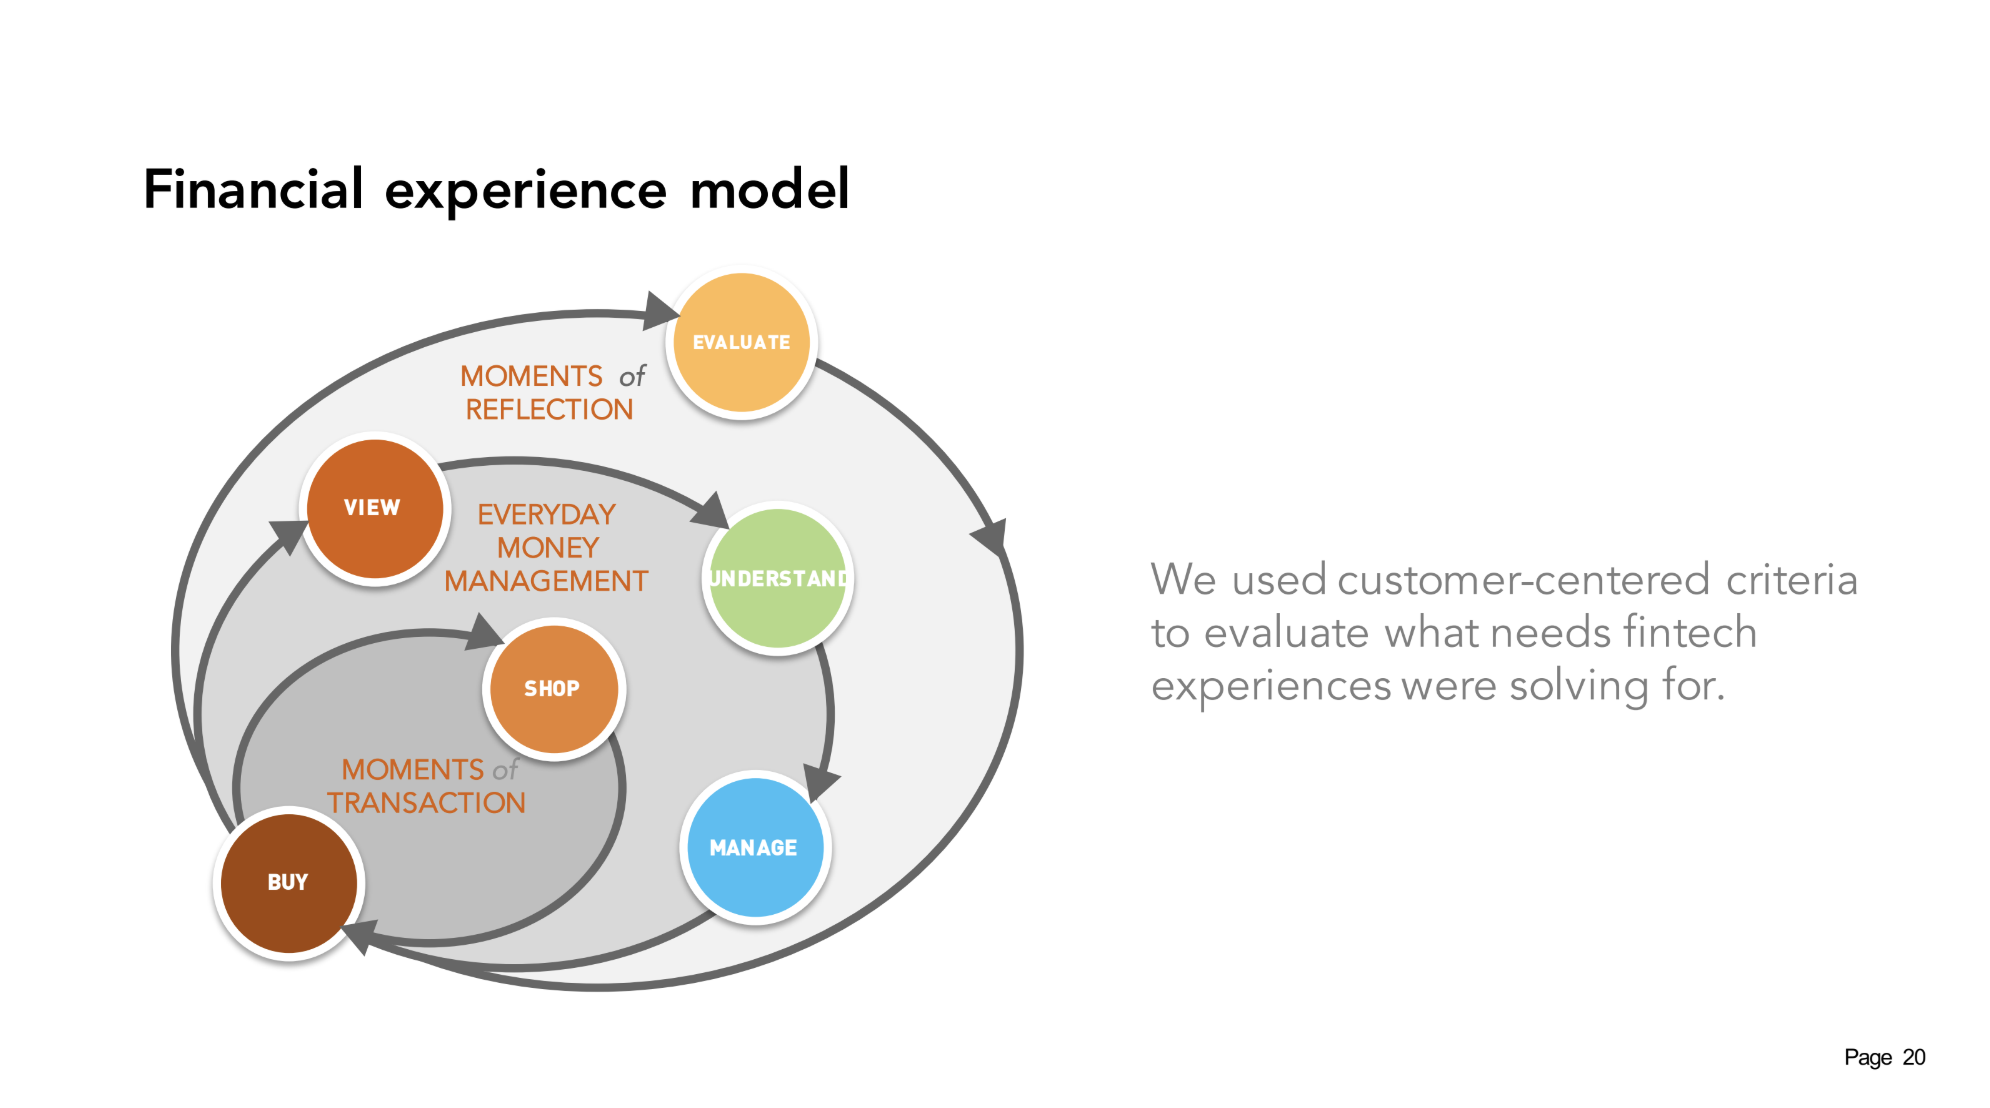 mc-bloom-fintech-experience-model